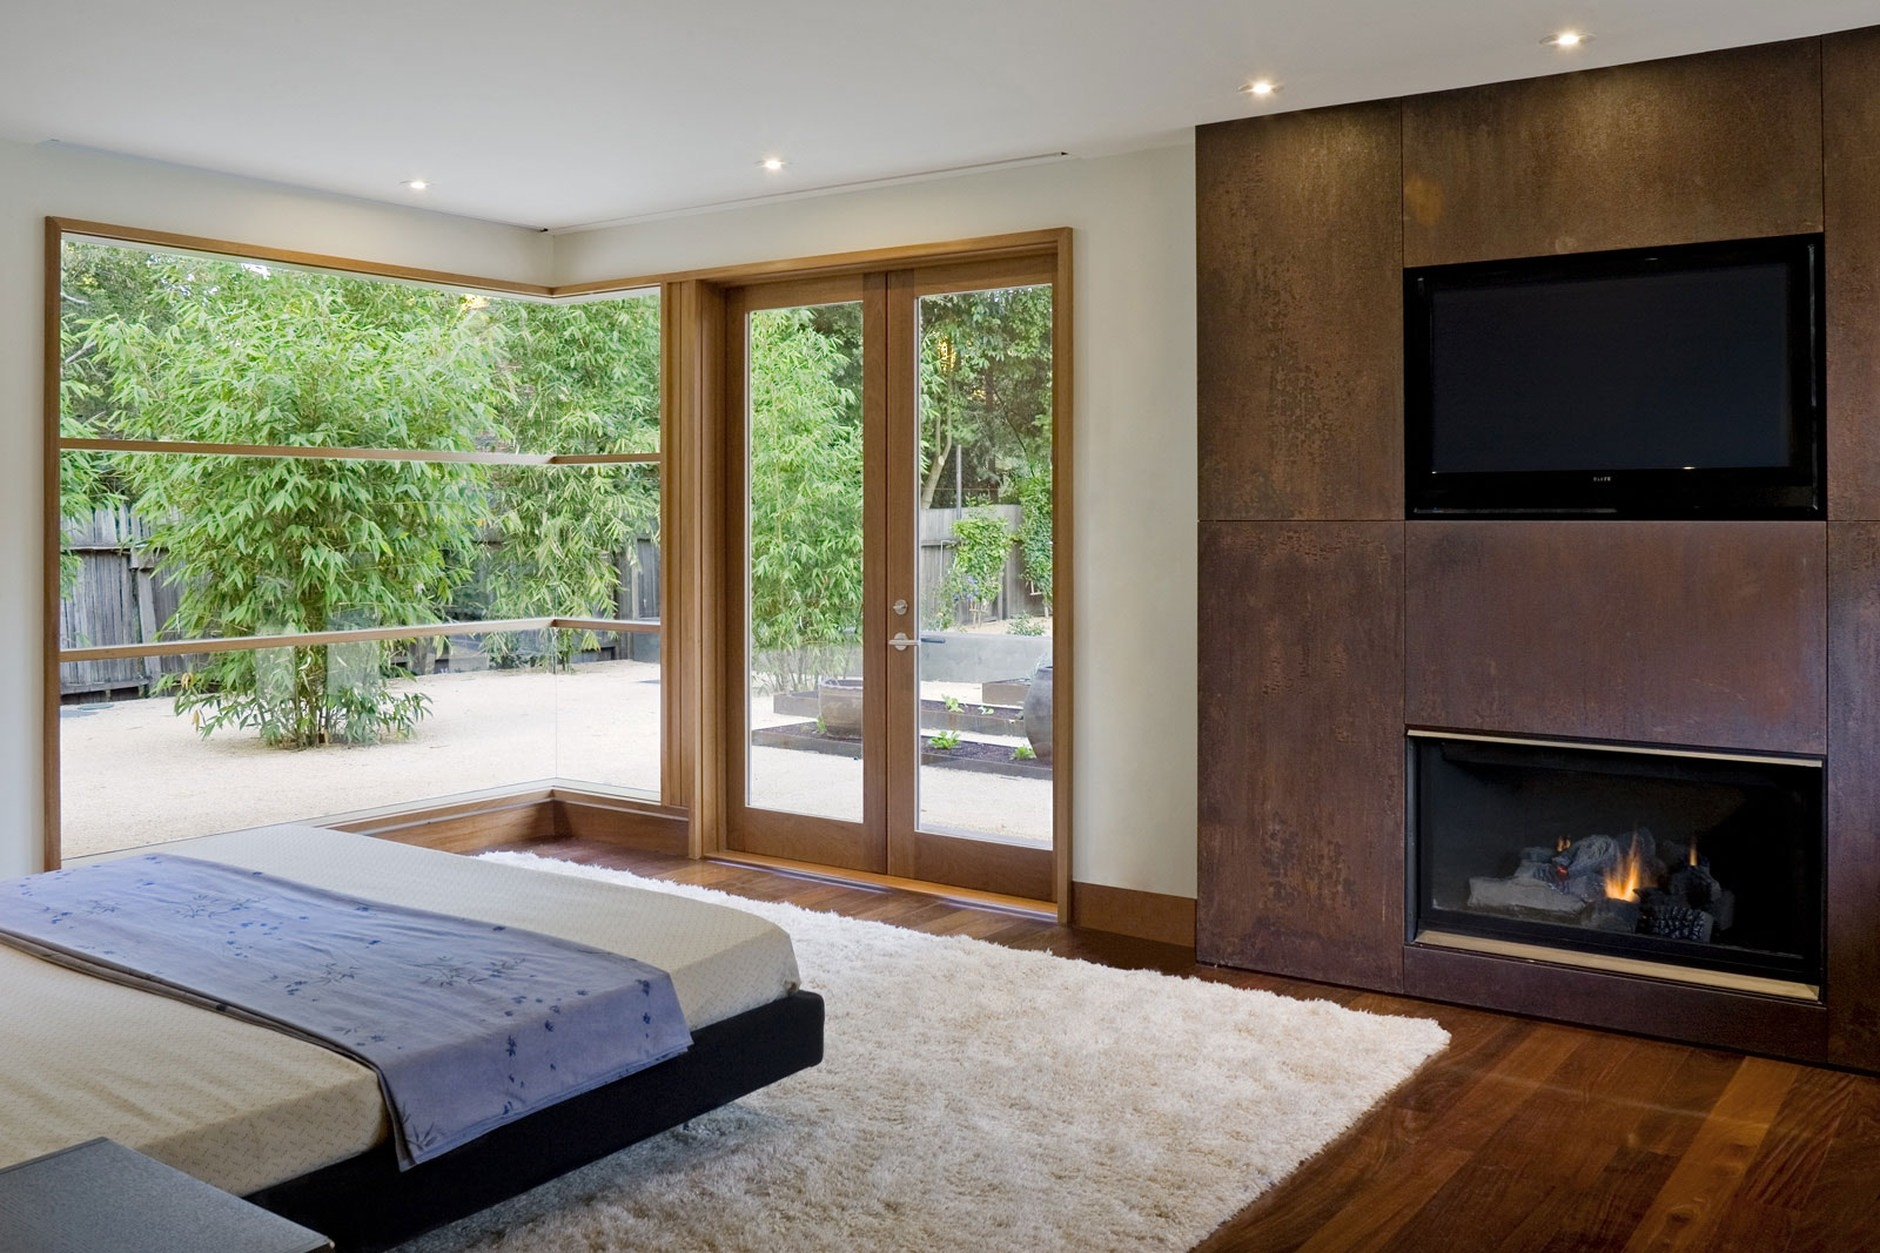 Wheeler Residence By William Duff Architects Karmatrendz